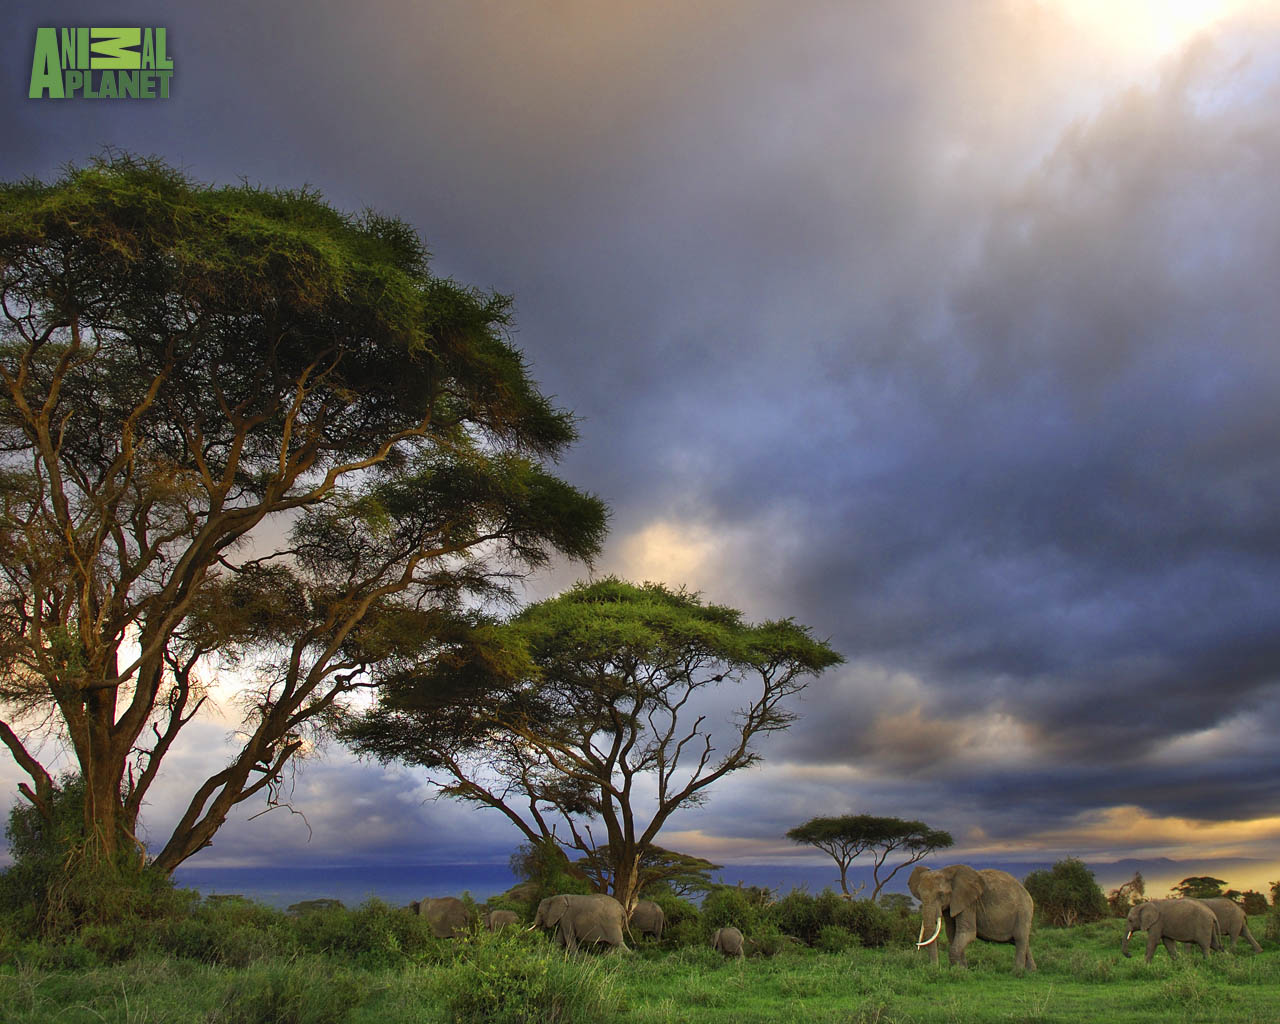 Animal Planet Wallpaper Download   elephants savannah 1280x1024